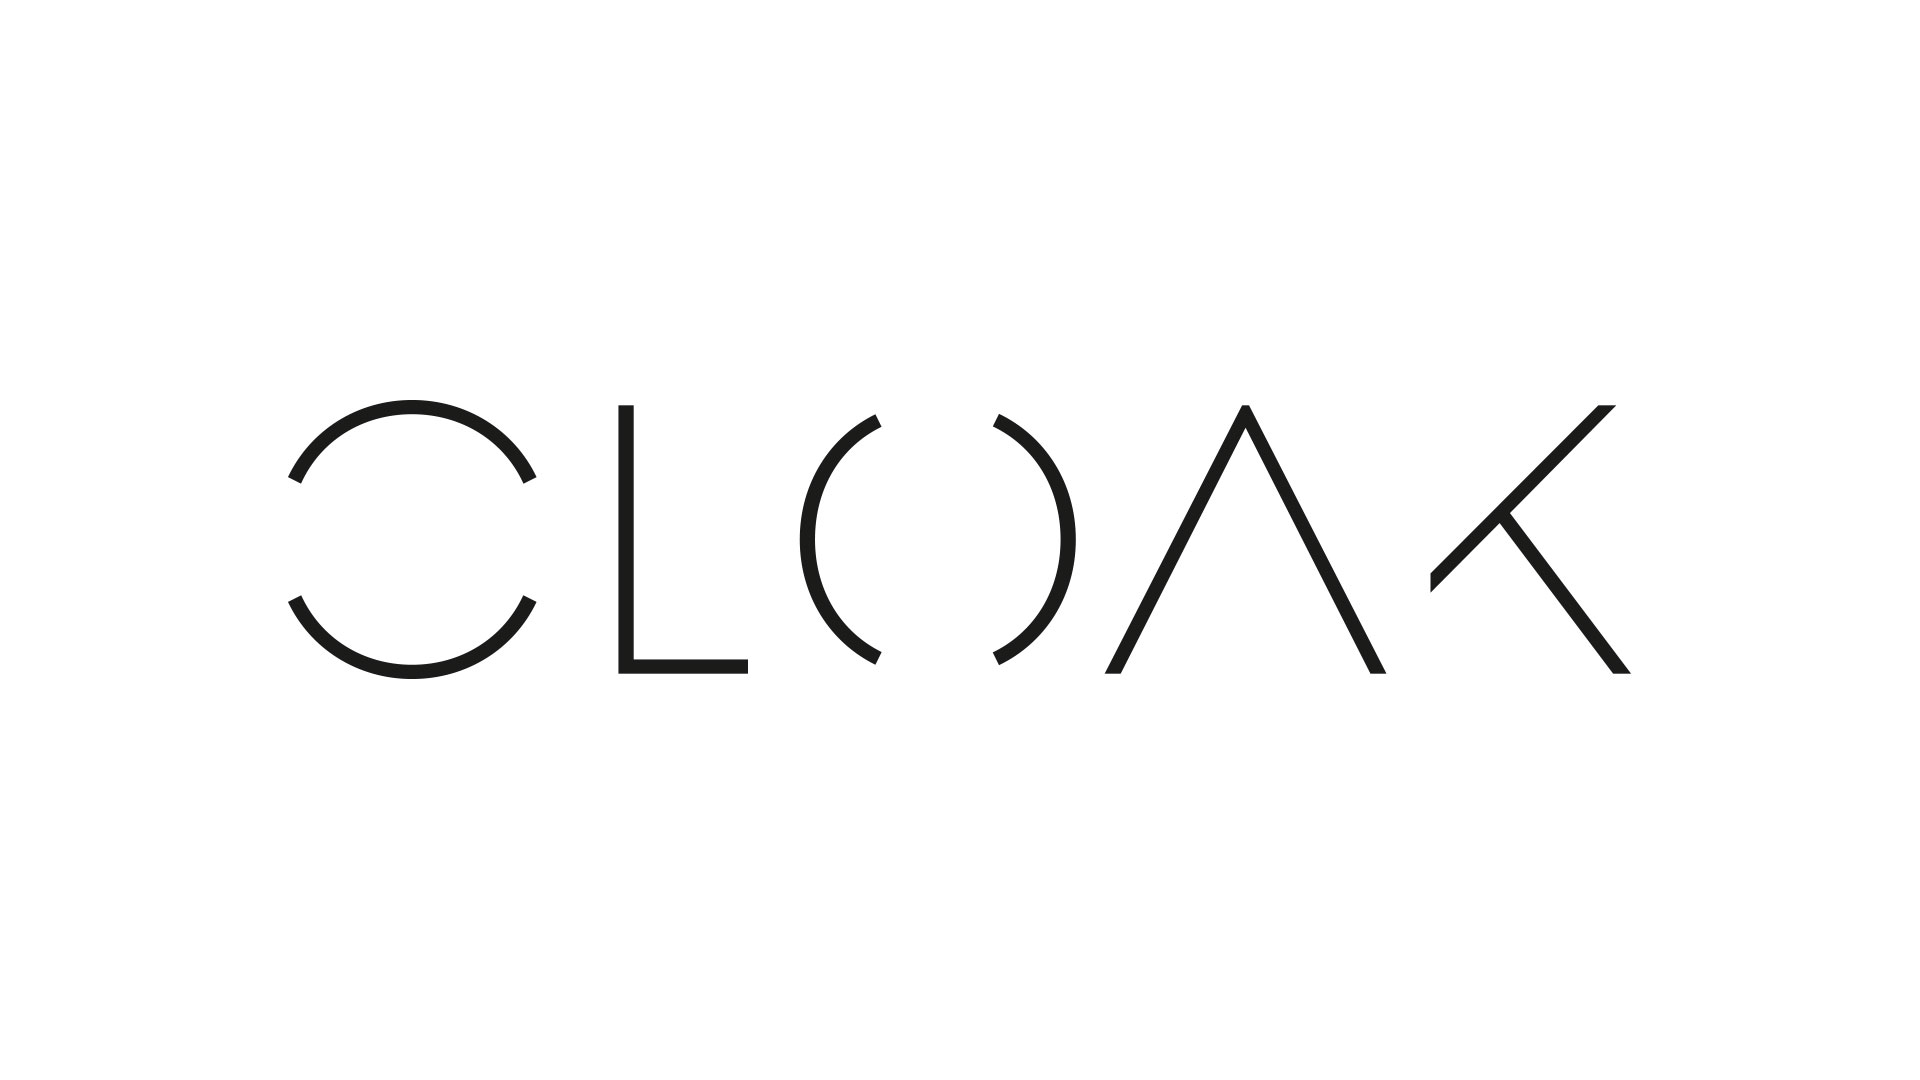 CLOAK_Logotype_lite